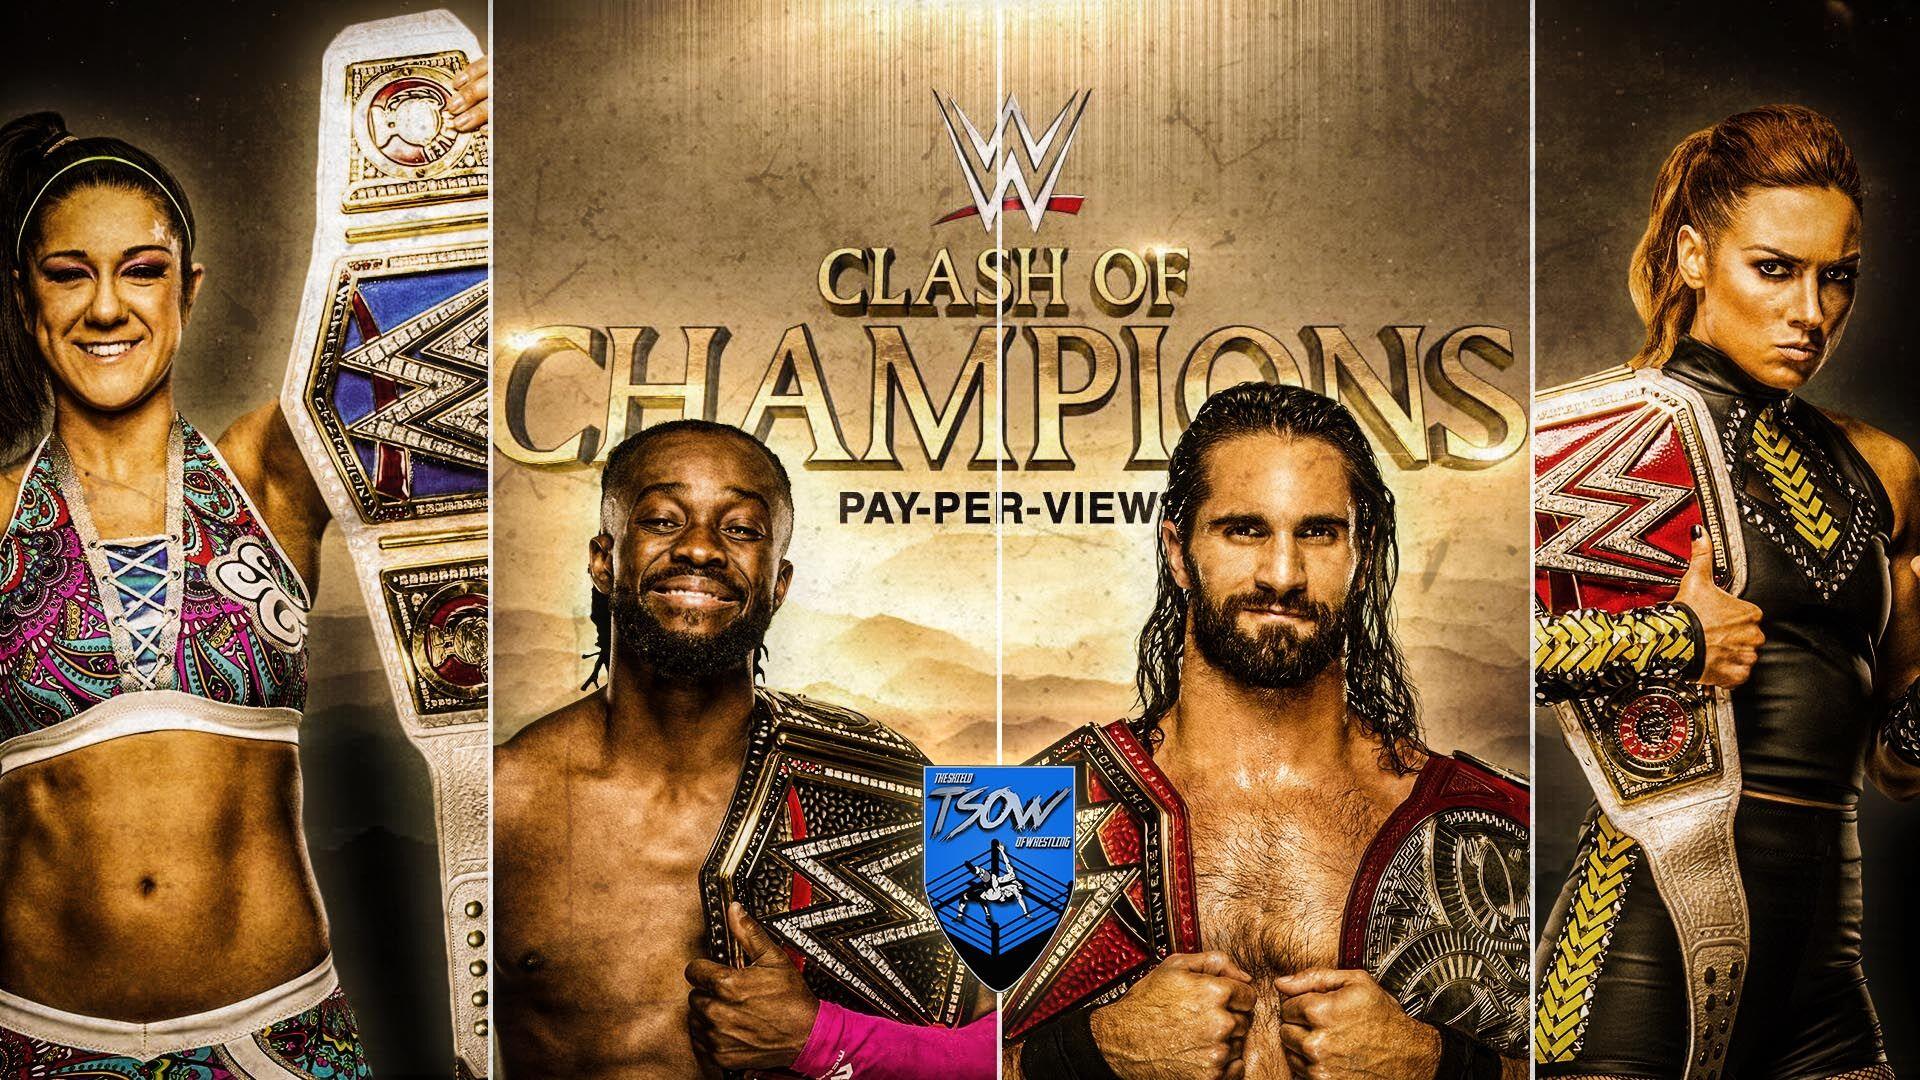 Clash - Clash of Champions